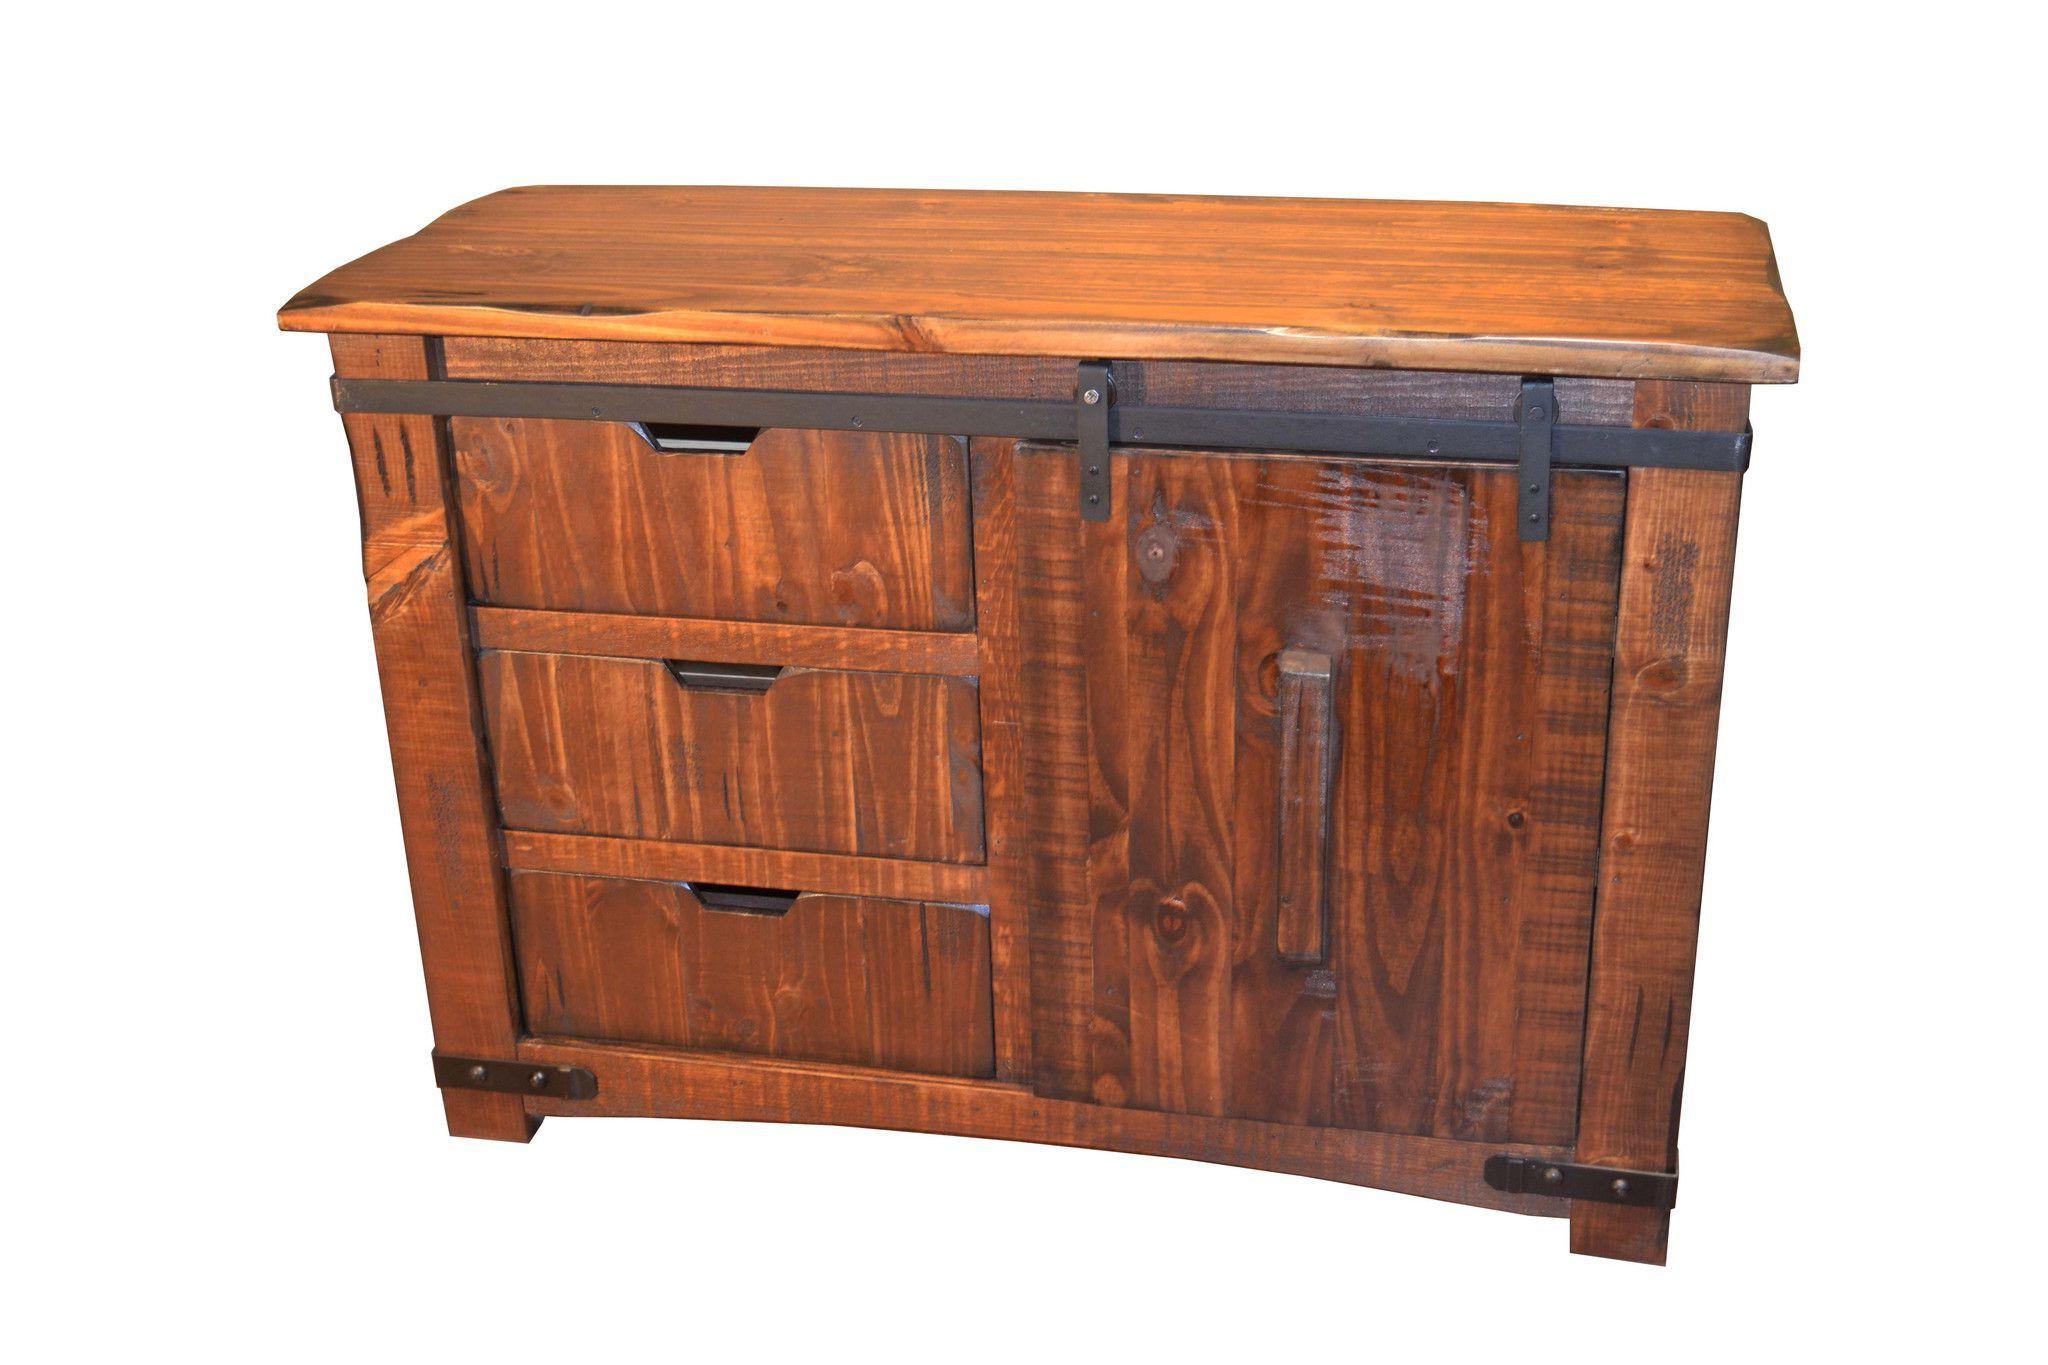 "Granville Sliding Door 50 Inch Tv Stand | Tv Stand Wood In Rustic Corner 50"" Solid Wood Tv Stands Gray (View 12 of 20)"